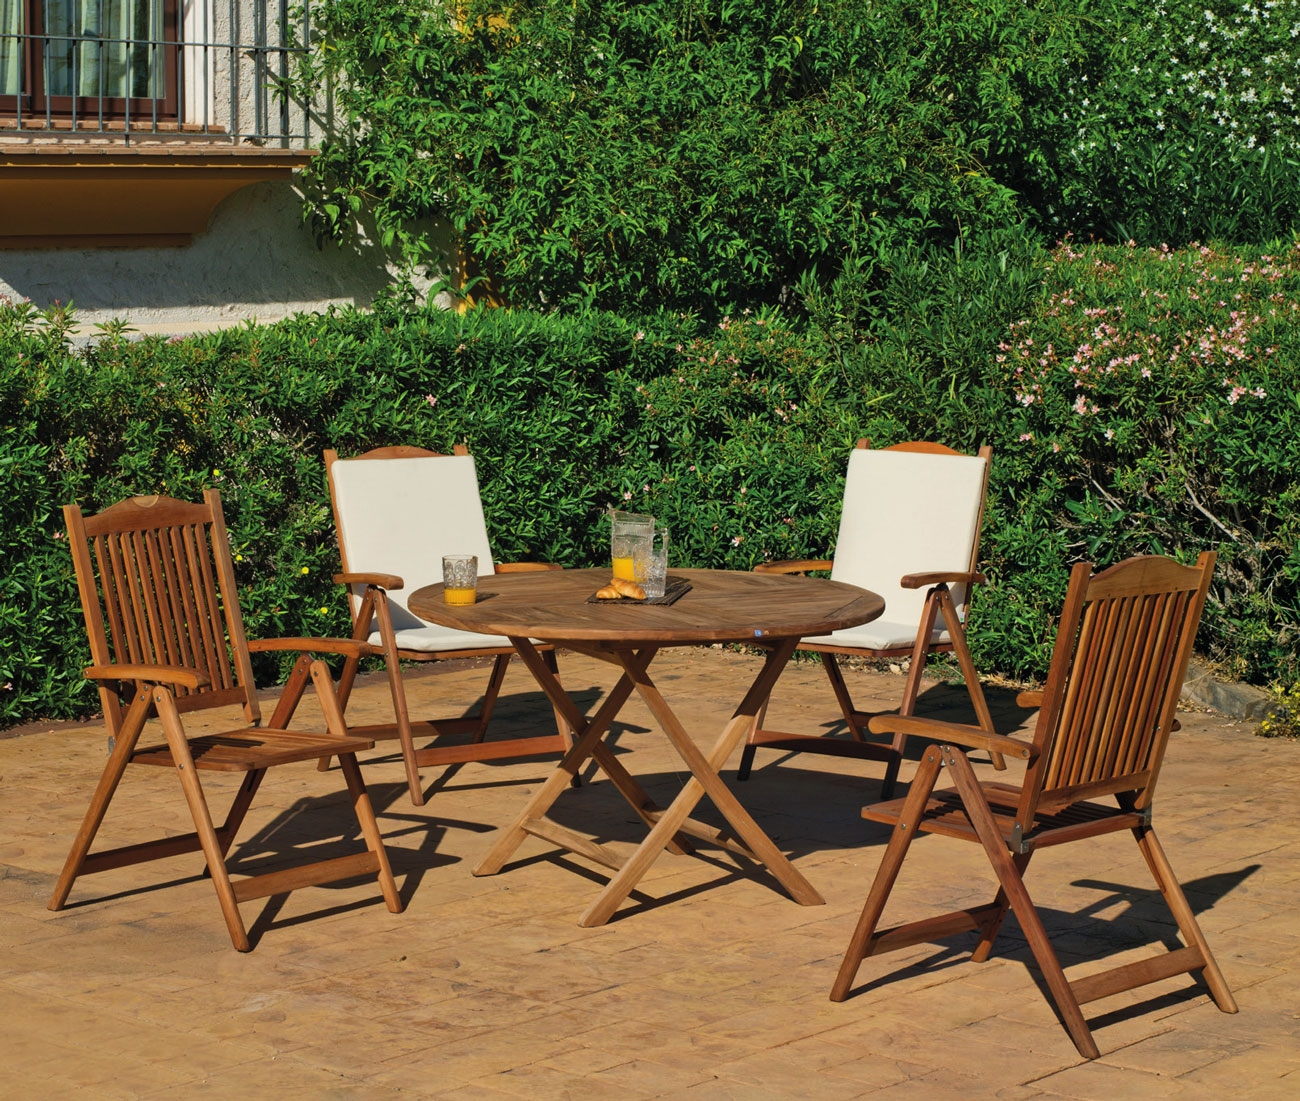 Set sillas y mesa madera King Seroni 120 - Set sillas y mesa madera King Seroni 120